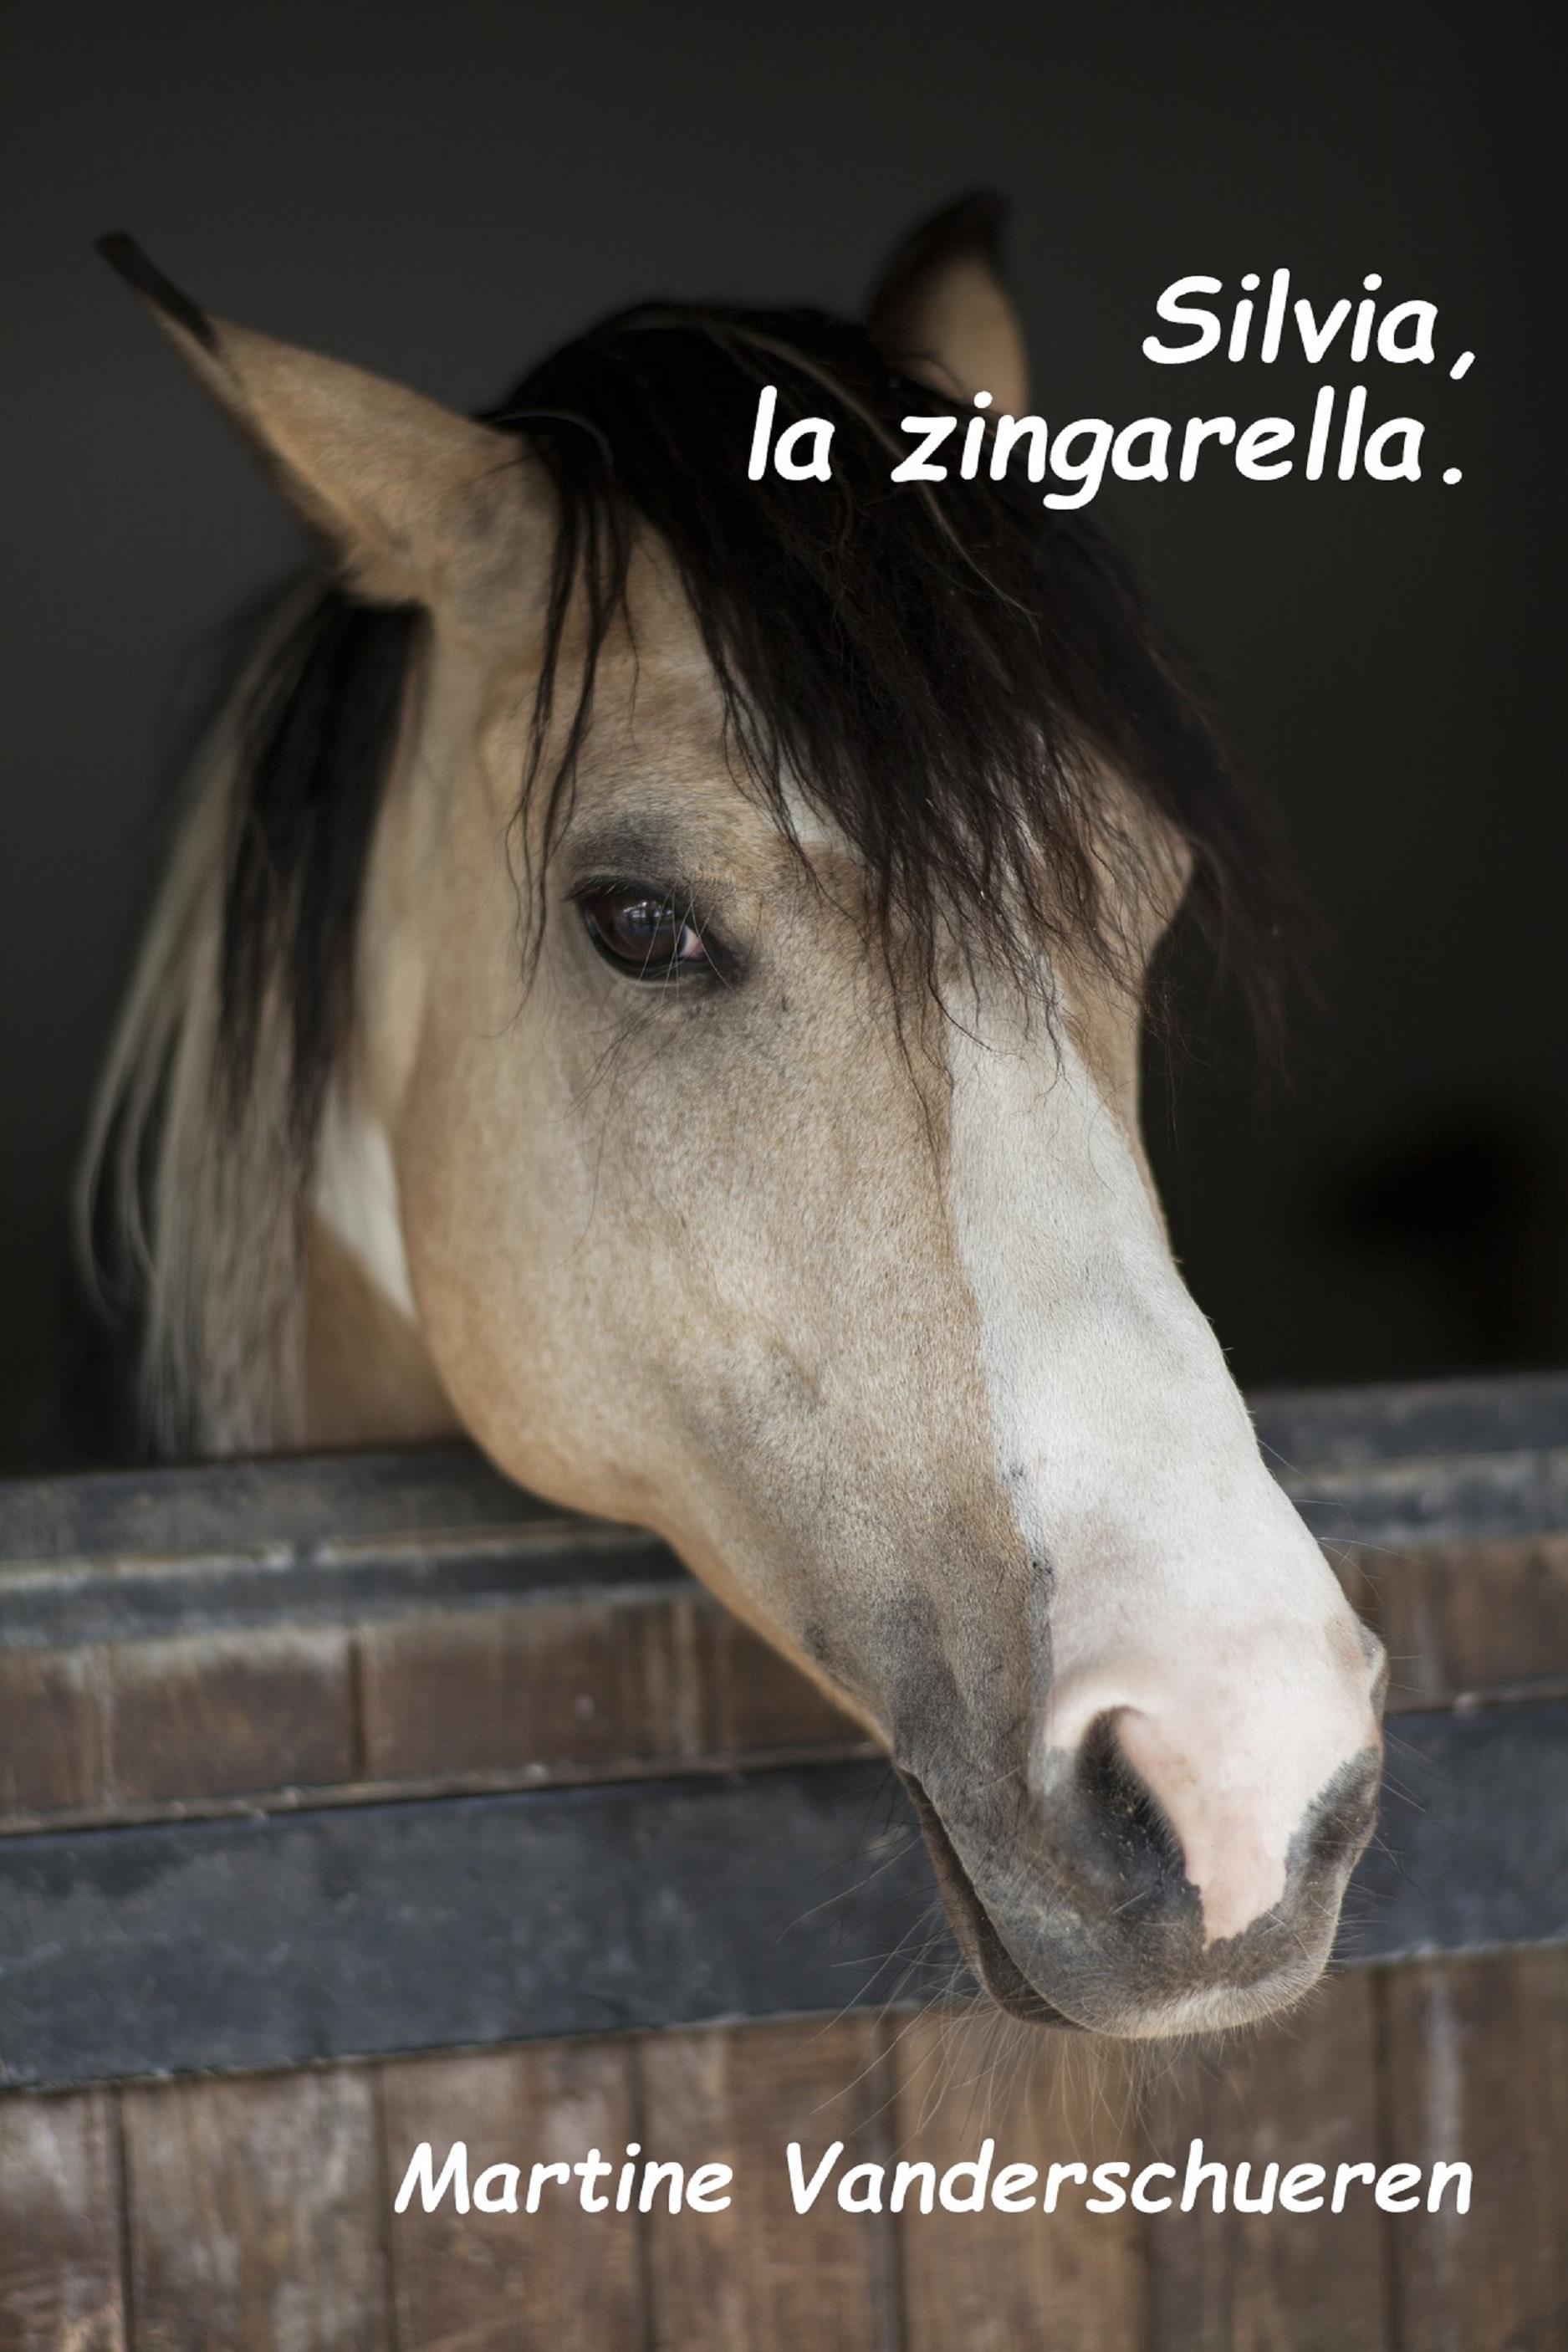 Silvia la zingarella